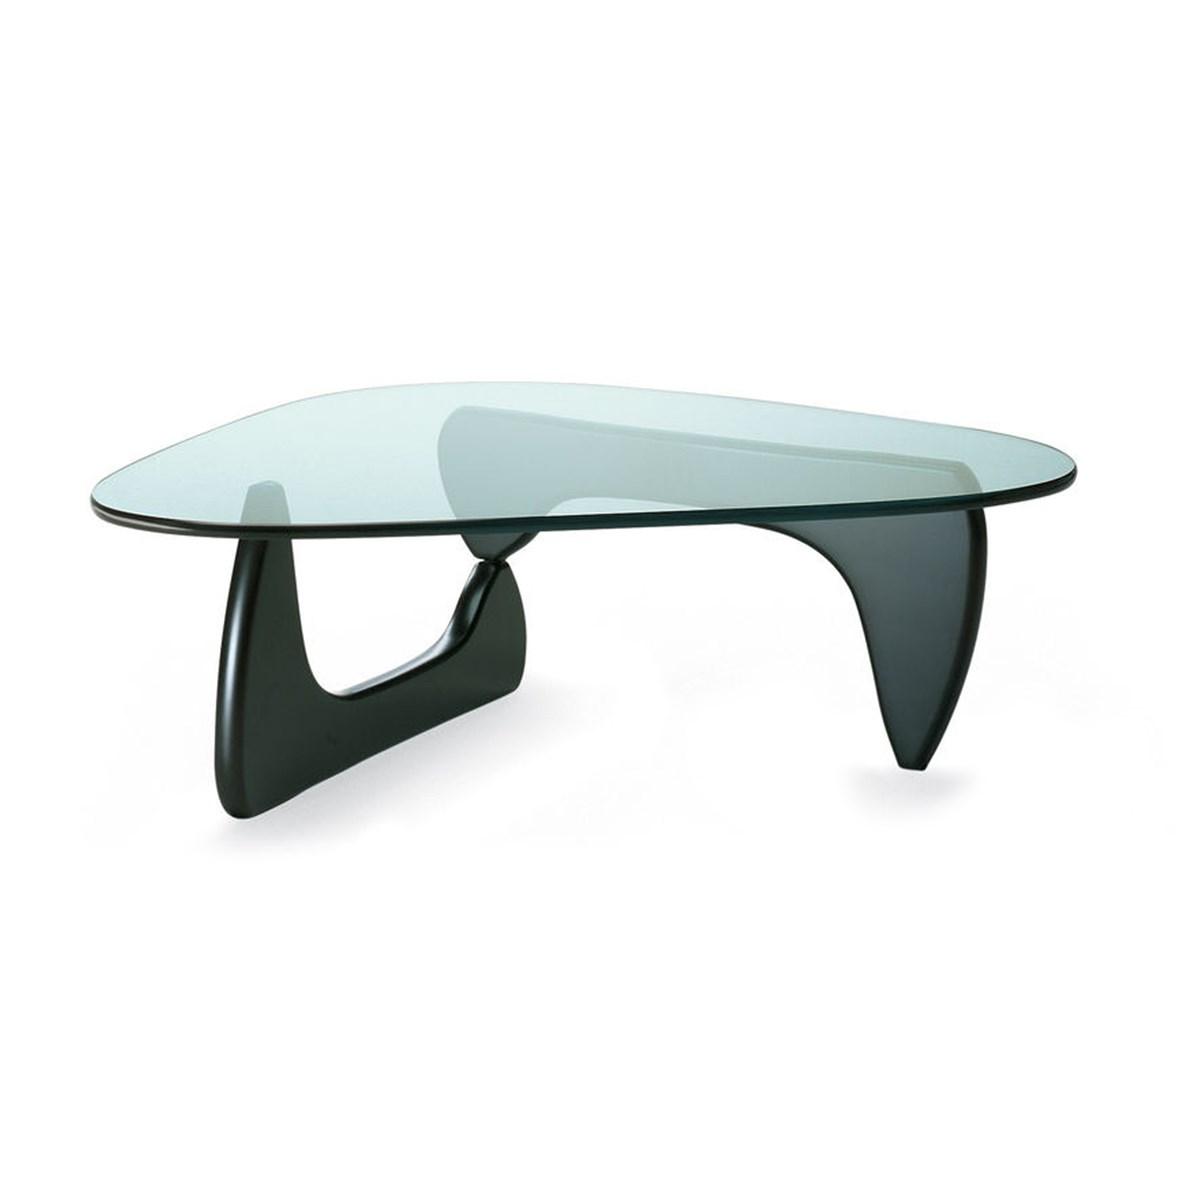 Vitra-Isamu-Noguchi-Noguchi-Coffee-Table-Matisse-1